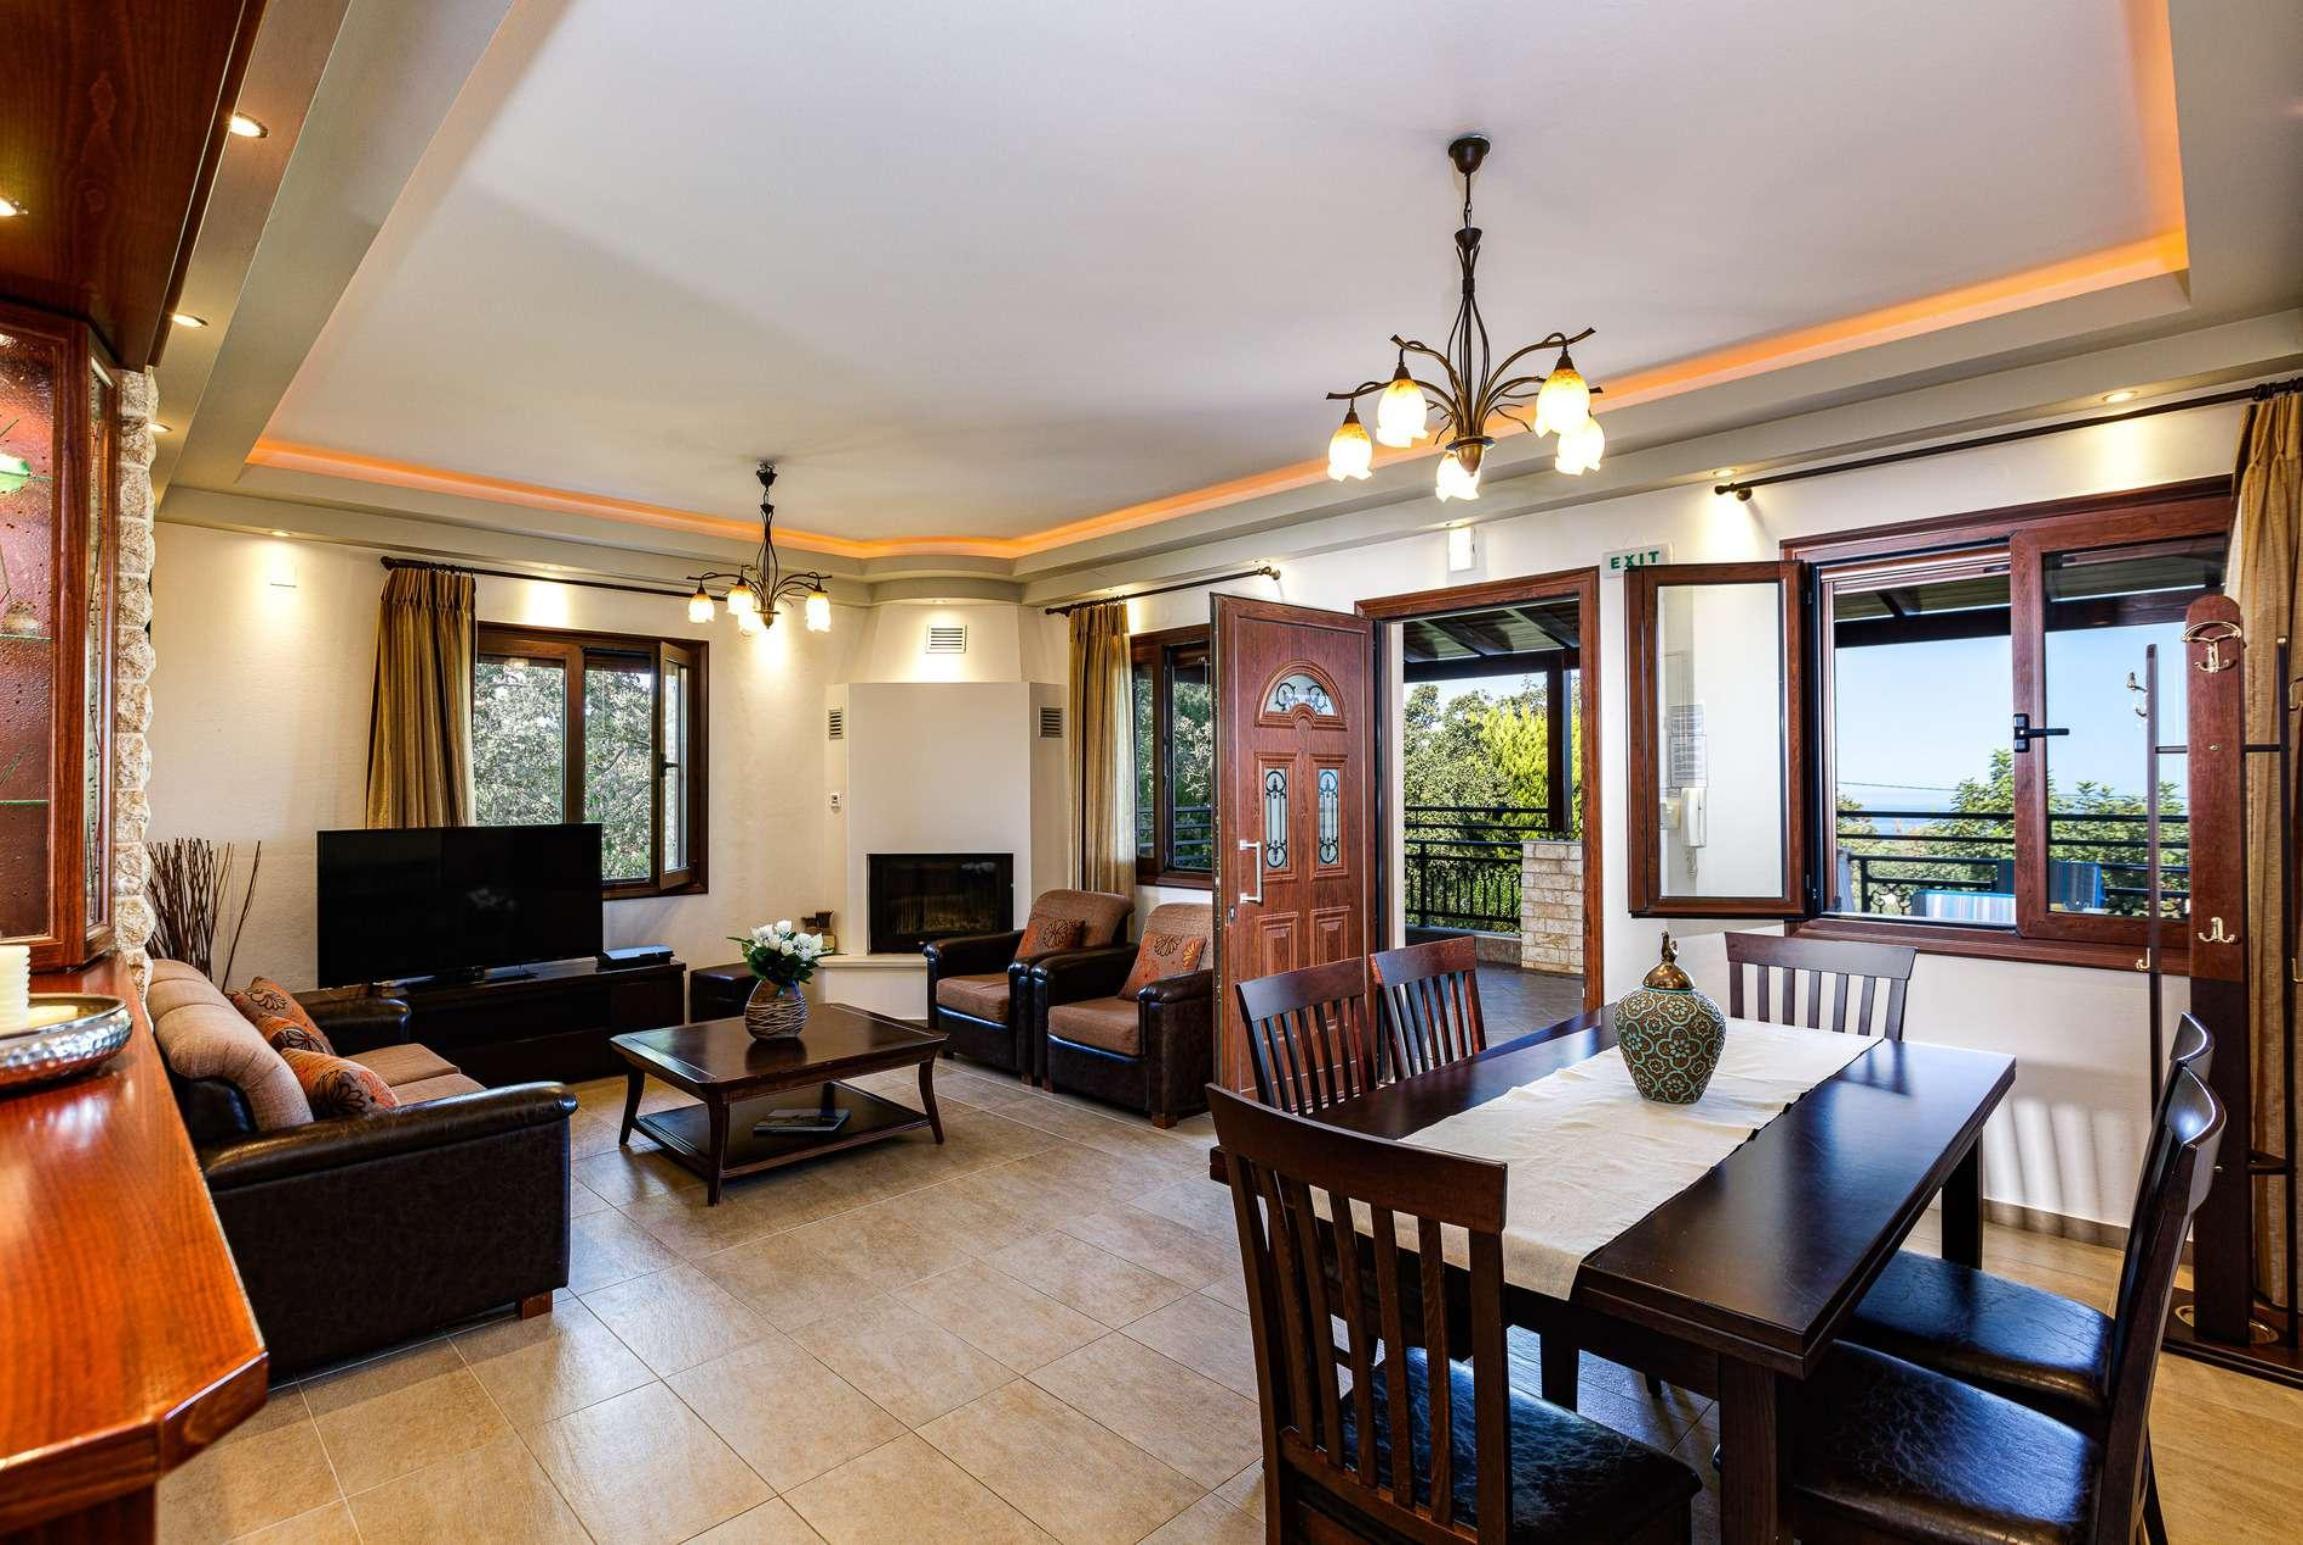 Ferienhaus Nefeli (2653931), Rethymno, Kreta Nordküste, Kreta, Griechenland, Bild 2